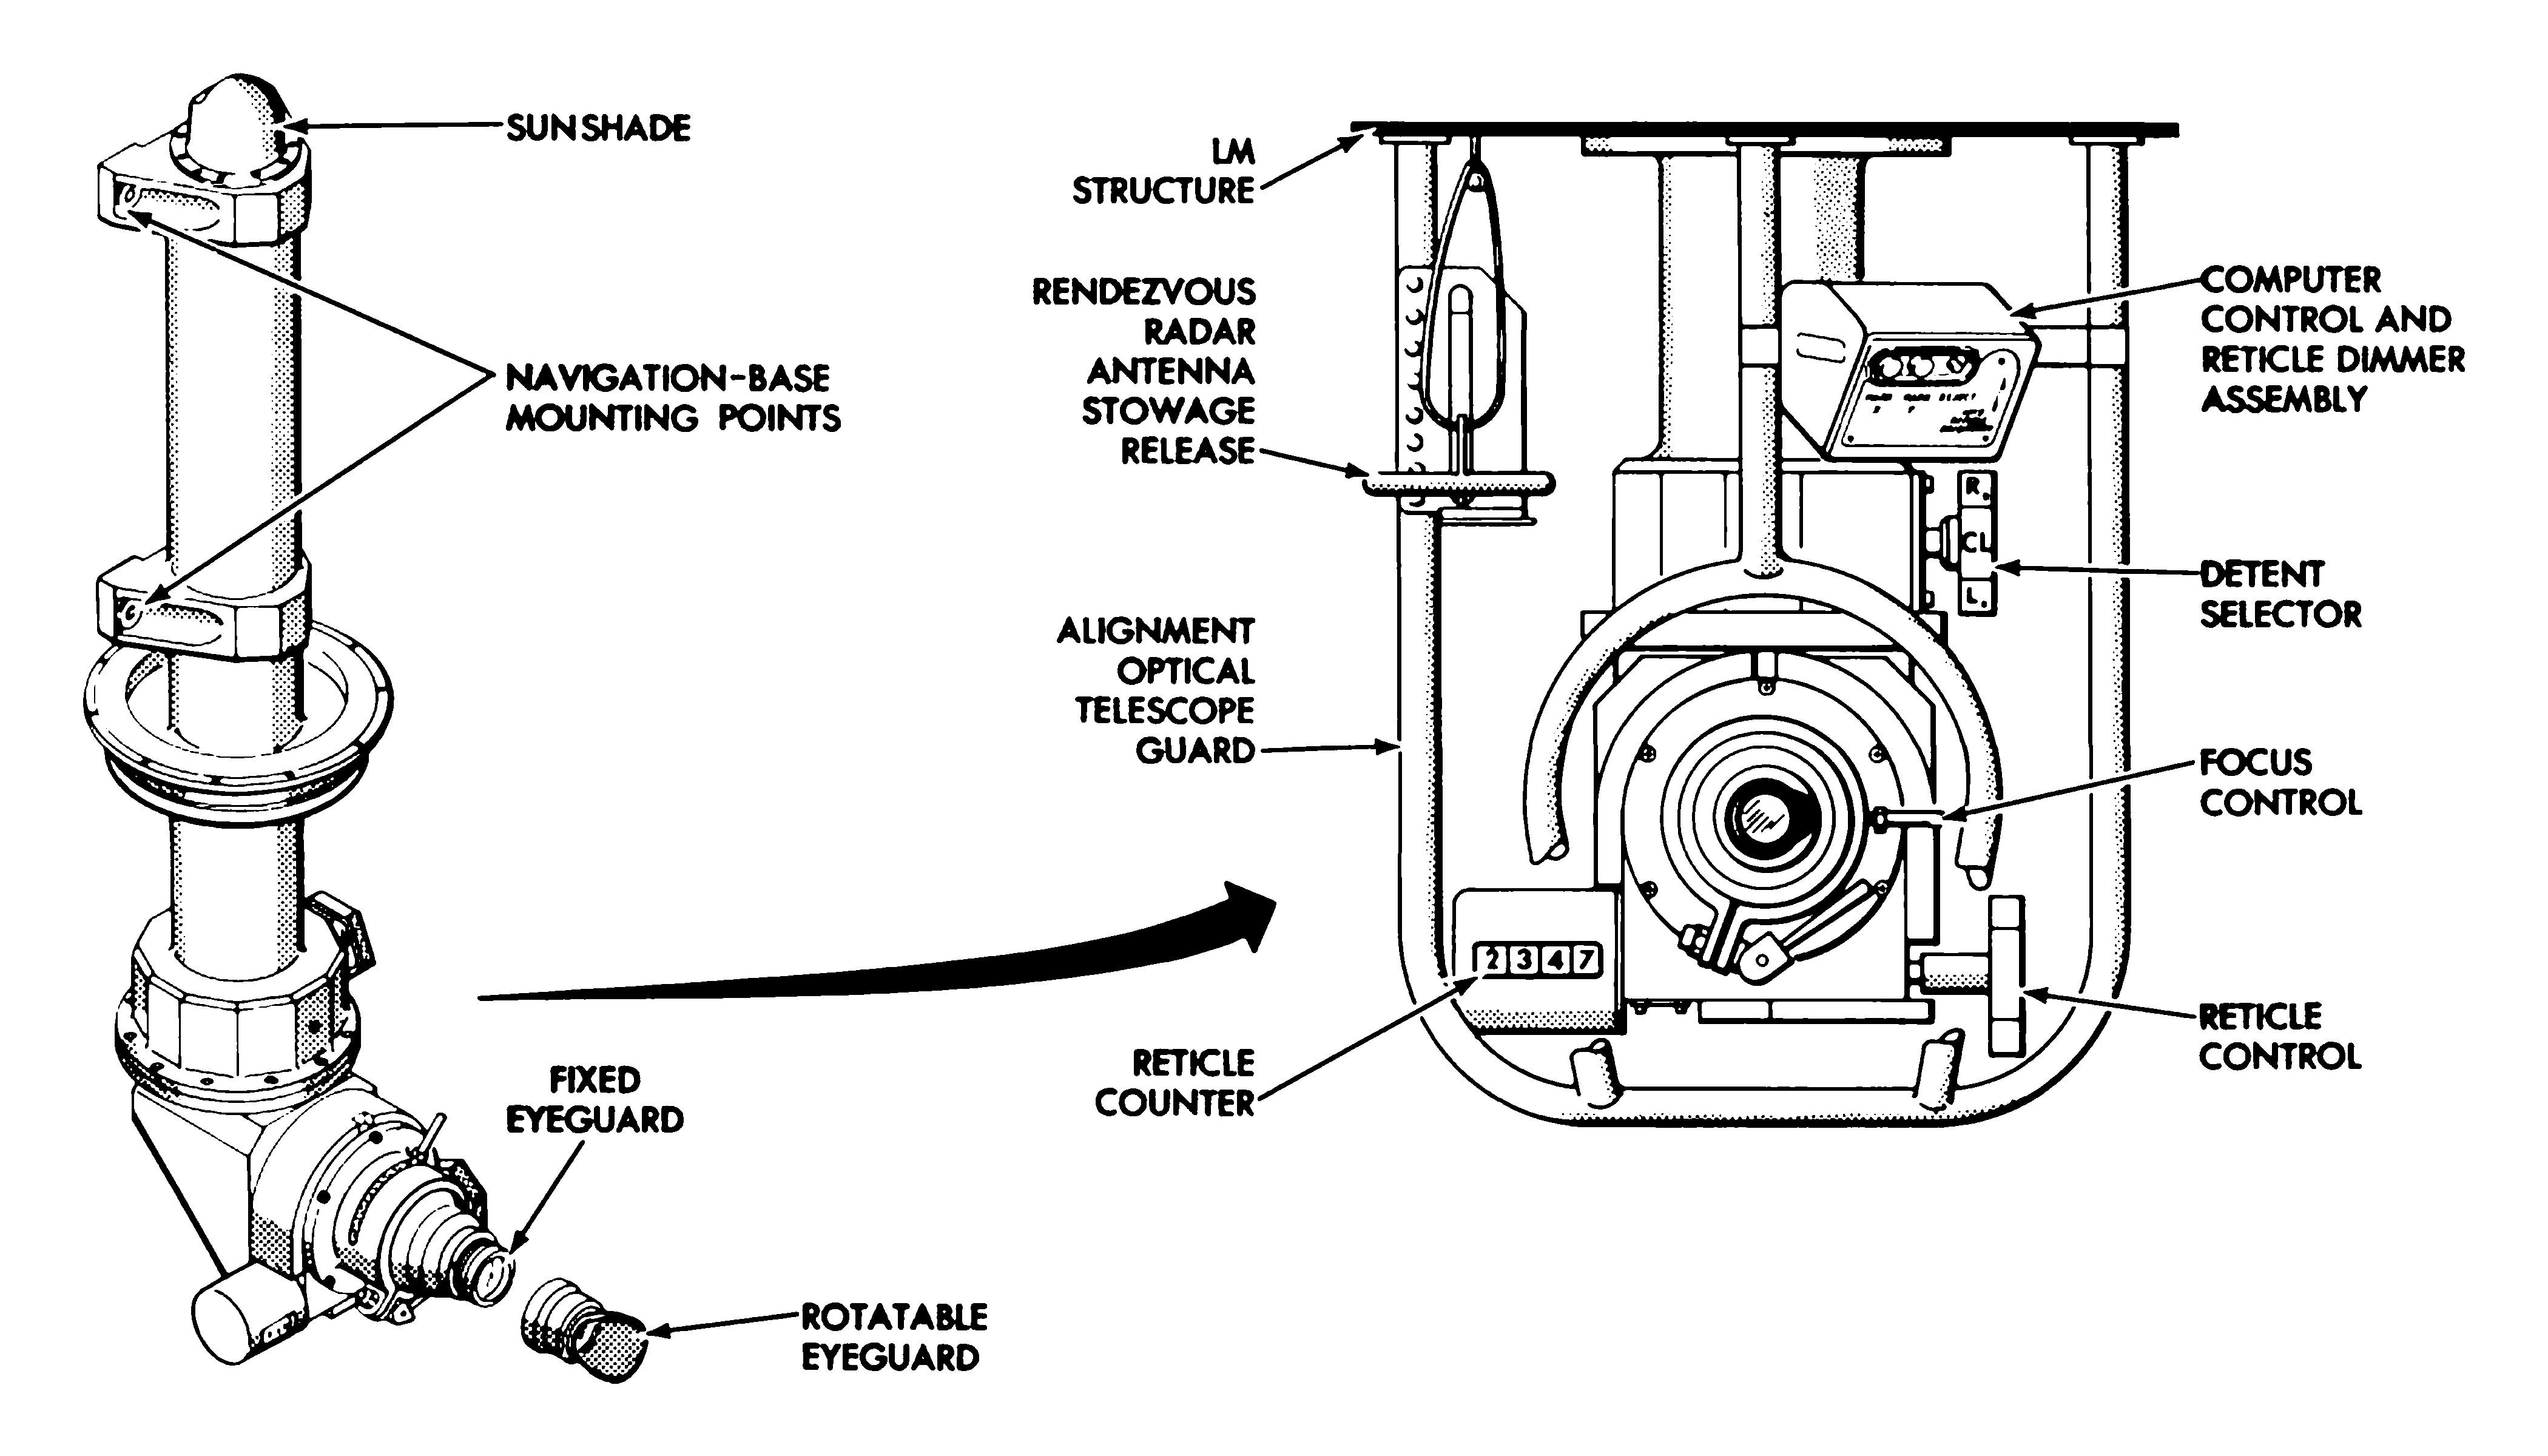 telescope optics ray diagram bobcat 863 parts alignment optical aot